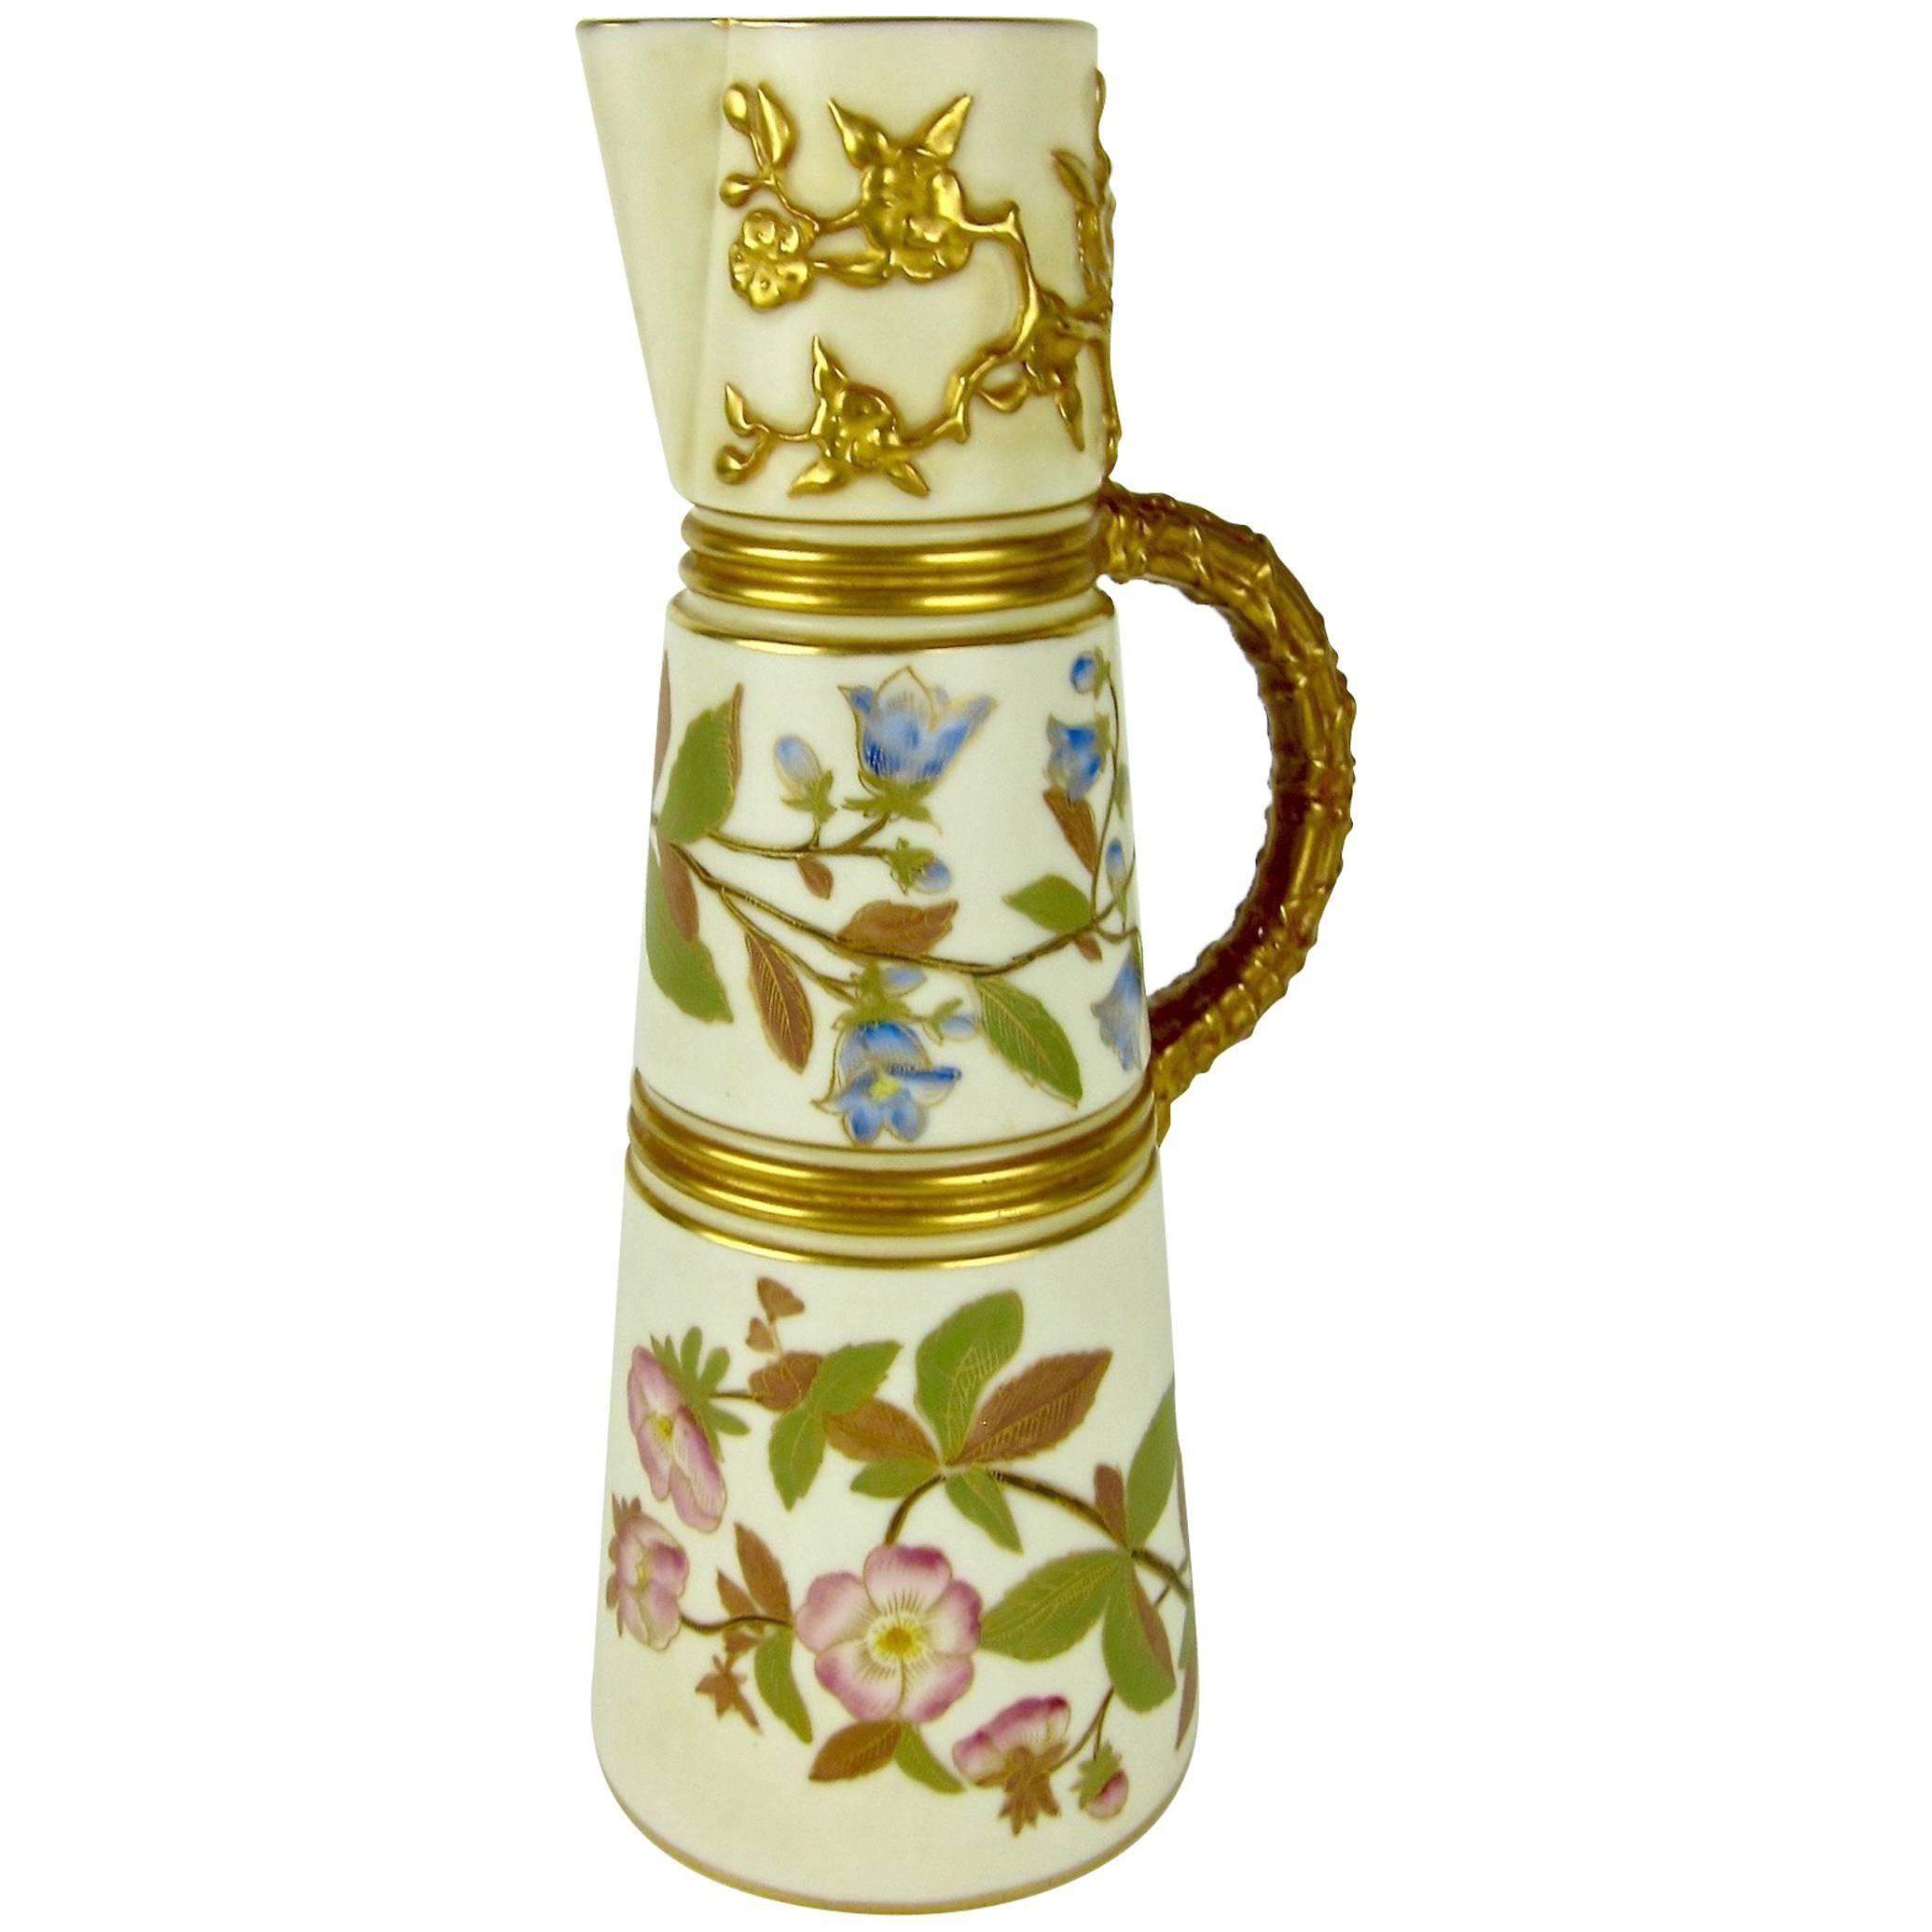 Antique english royal worcester porcelain ewer 1884 at 1stdibs reviewsmspy